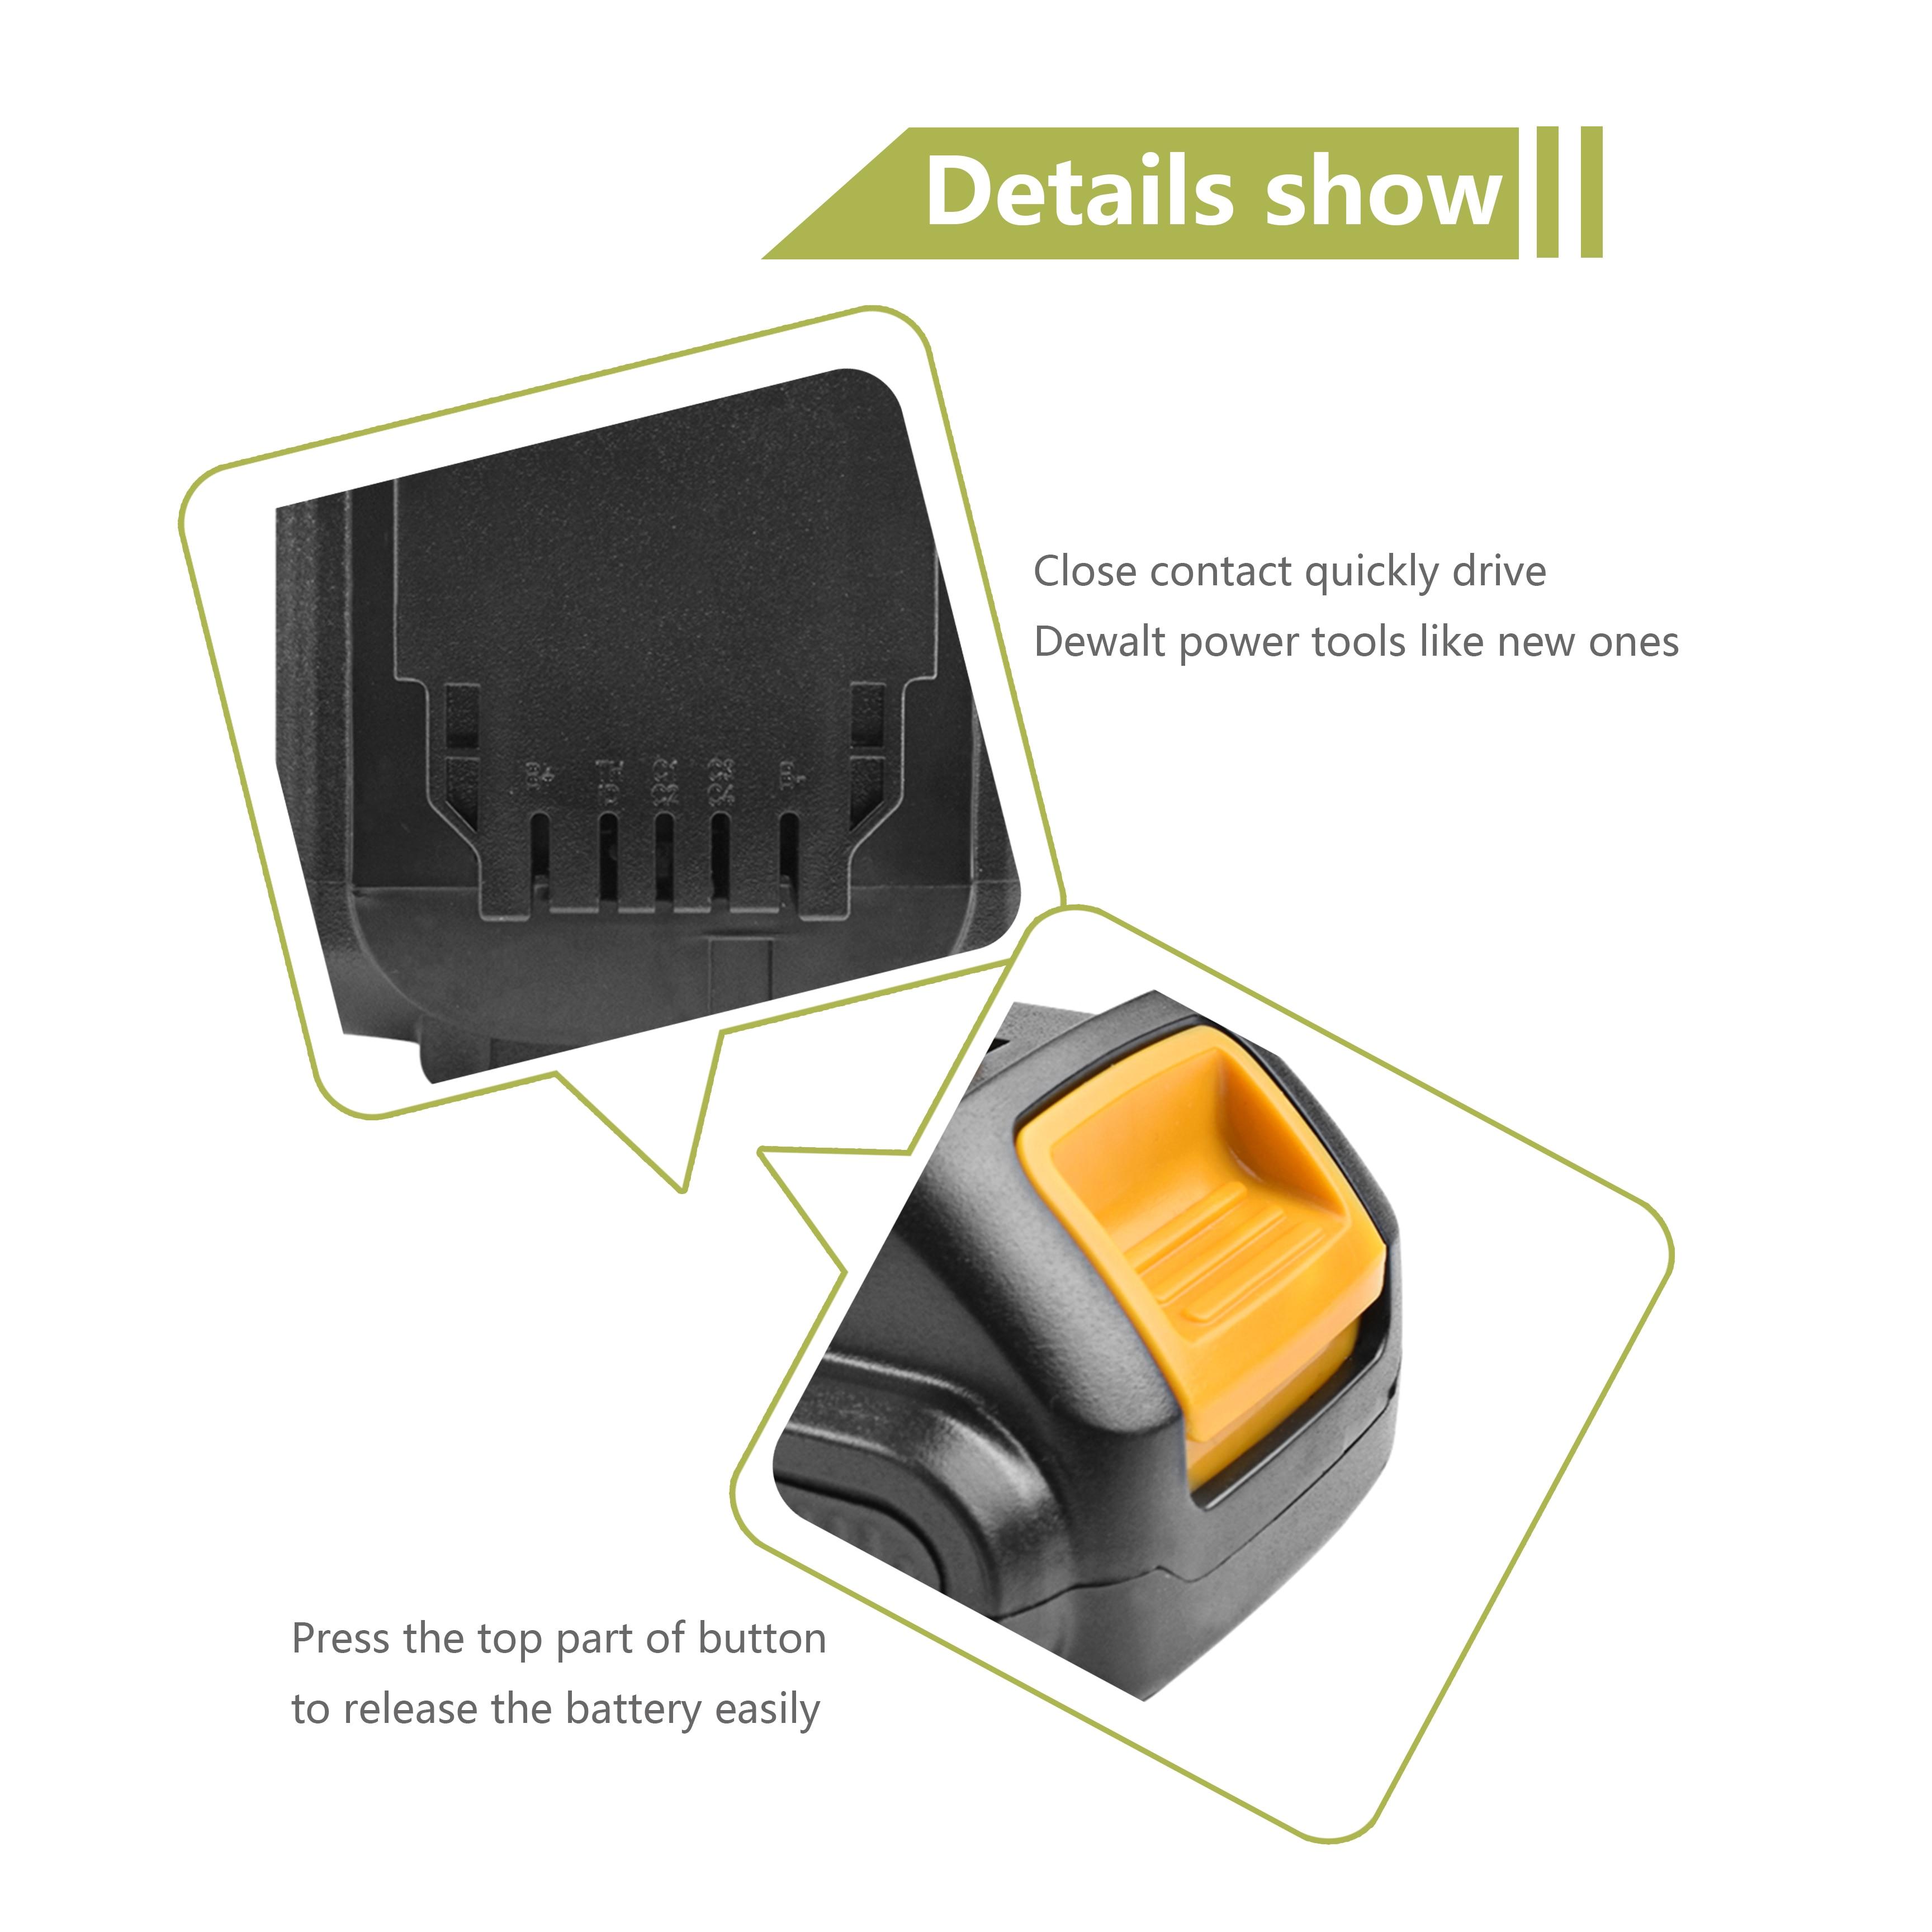 Image 5 - Bonacell Battery for Dewalt 4000mAh Replacement Battery for DCB200 DCB181 DCB182 DCB204 2  DCB201 DCB201 2 L10-in Replacement Batteries from Consumer Electronics